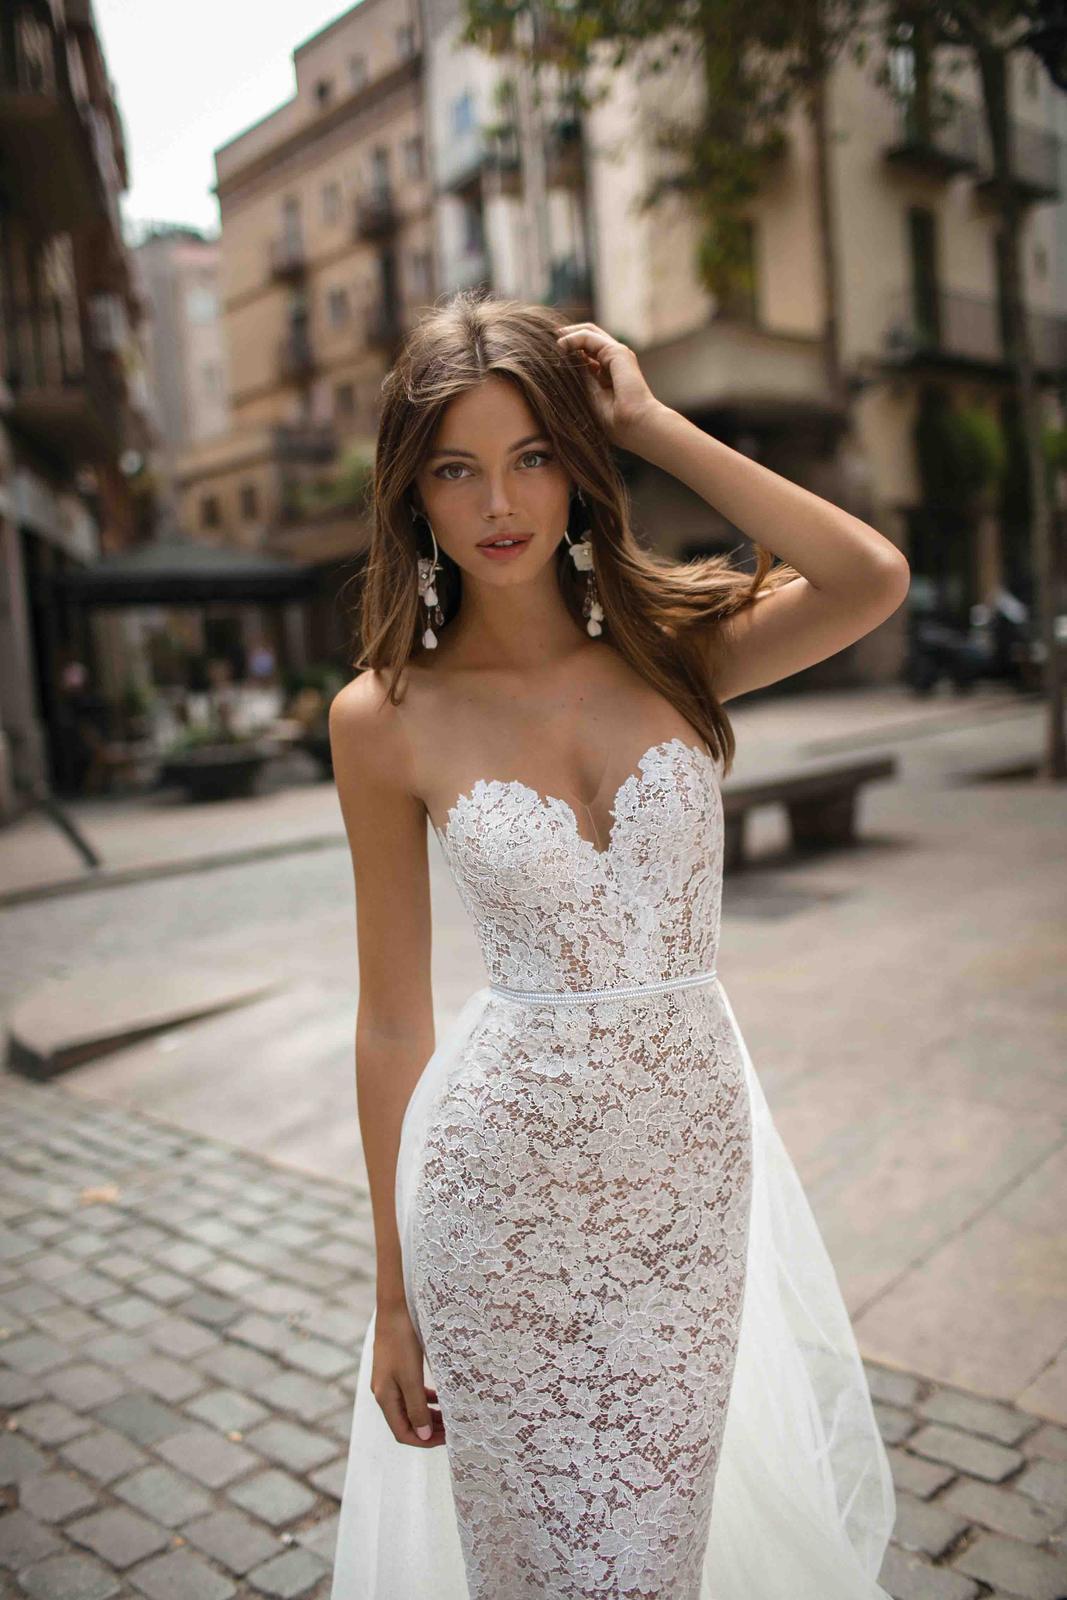 Muse by Berta * Svadobné šaty z kolekcií na rok 2019 - Obrázok č. 26